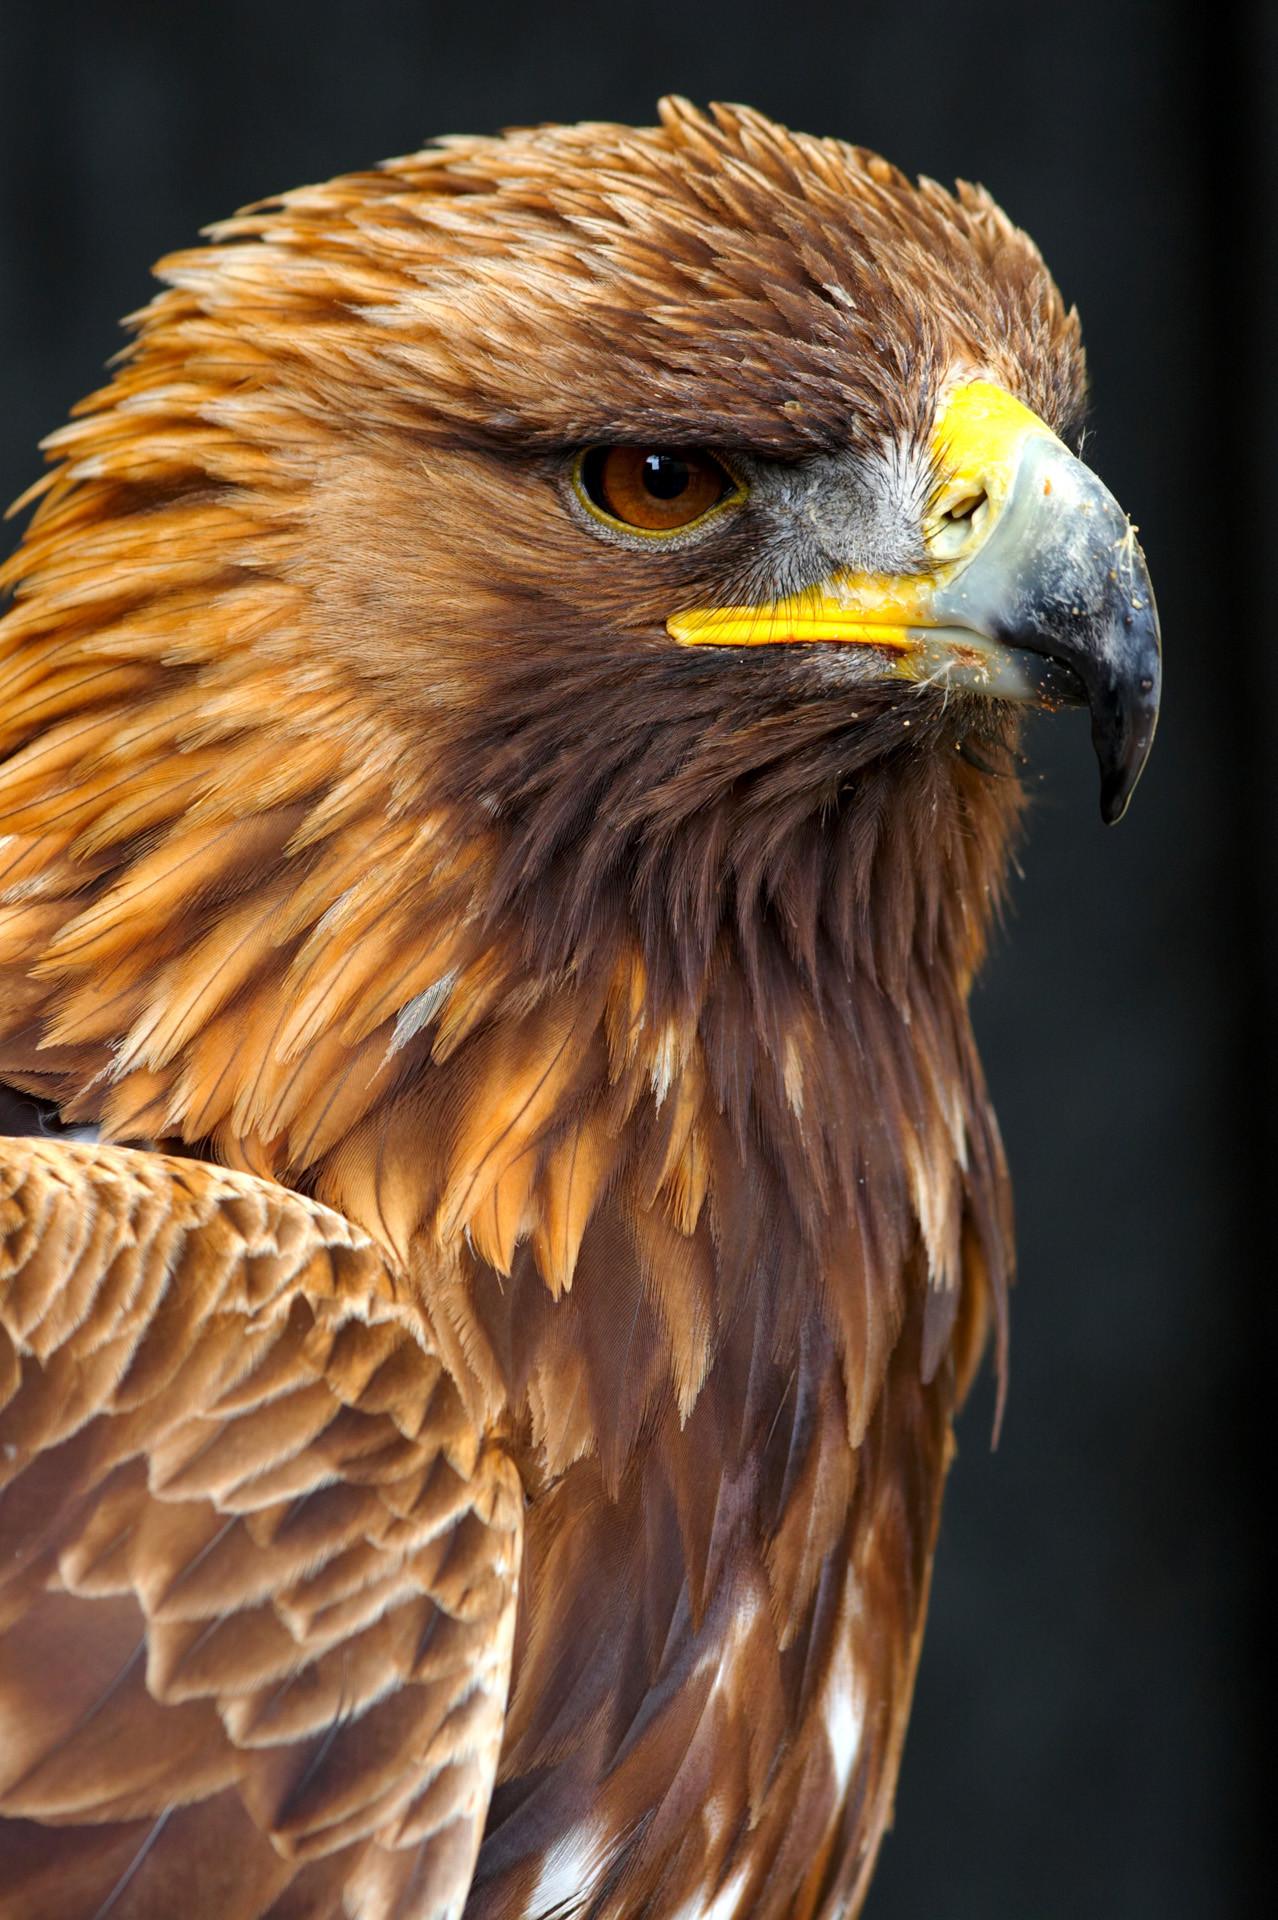 Golden eagle wallpaper 61 images for Gold bird wallpaper